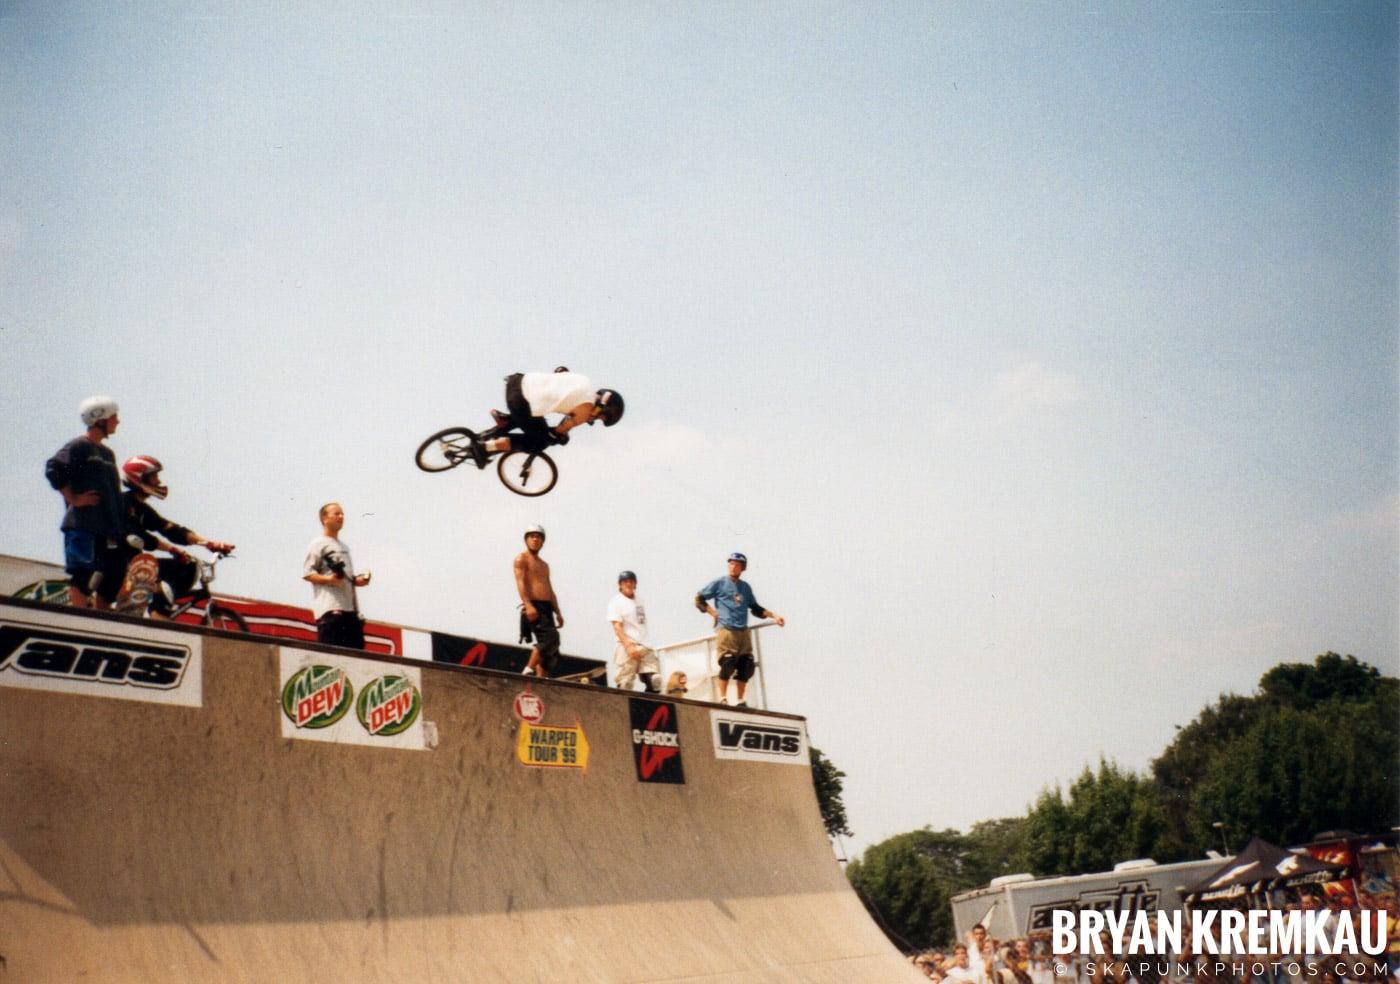 Skaters @ Vans Warped Tour, Randall's Island, NYC - 7.16.99 (7)